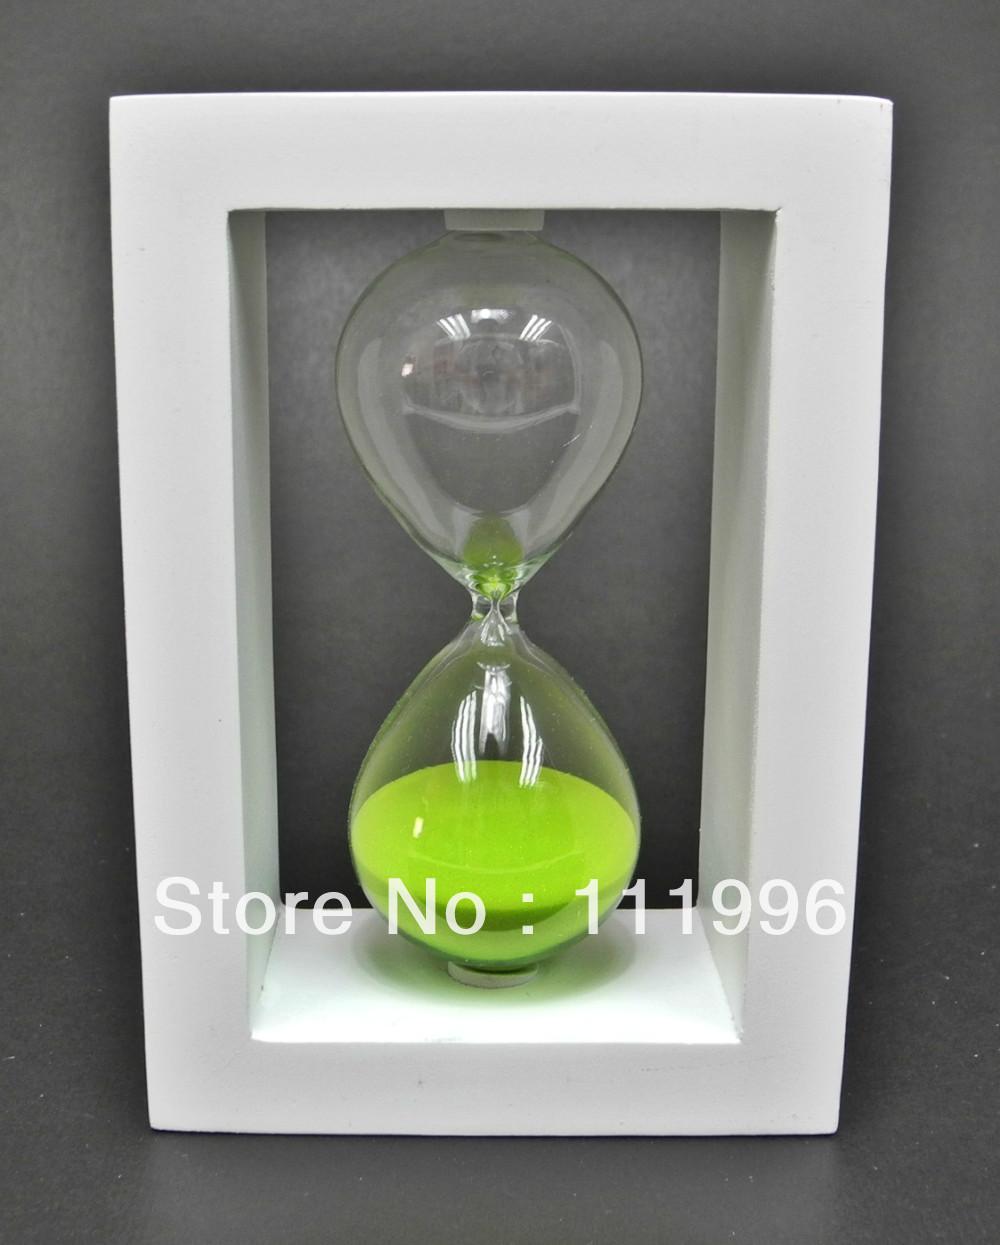 hourglass - Aliexpress.com -의 YibangTrading Co., Ltd.에서 hourglass 중국의 ...